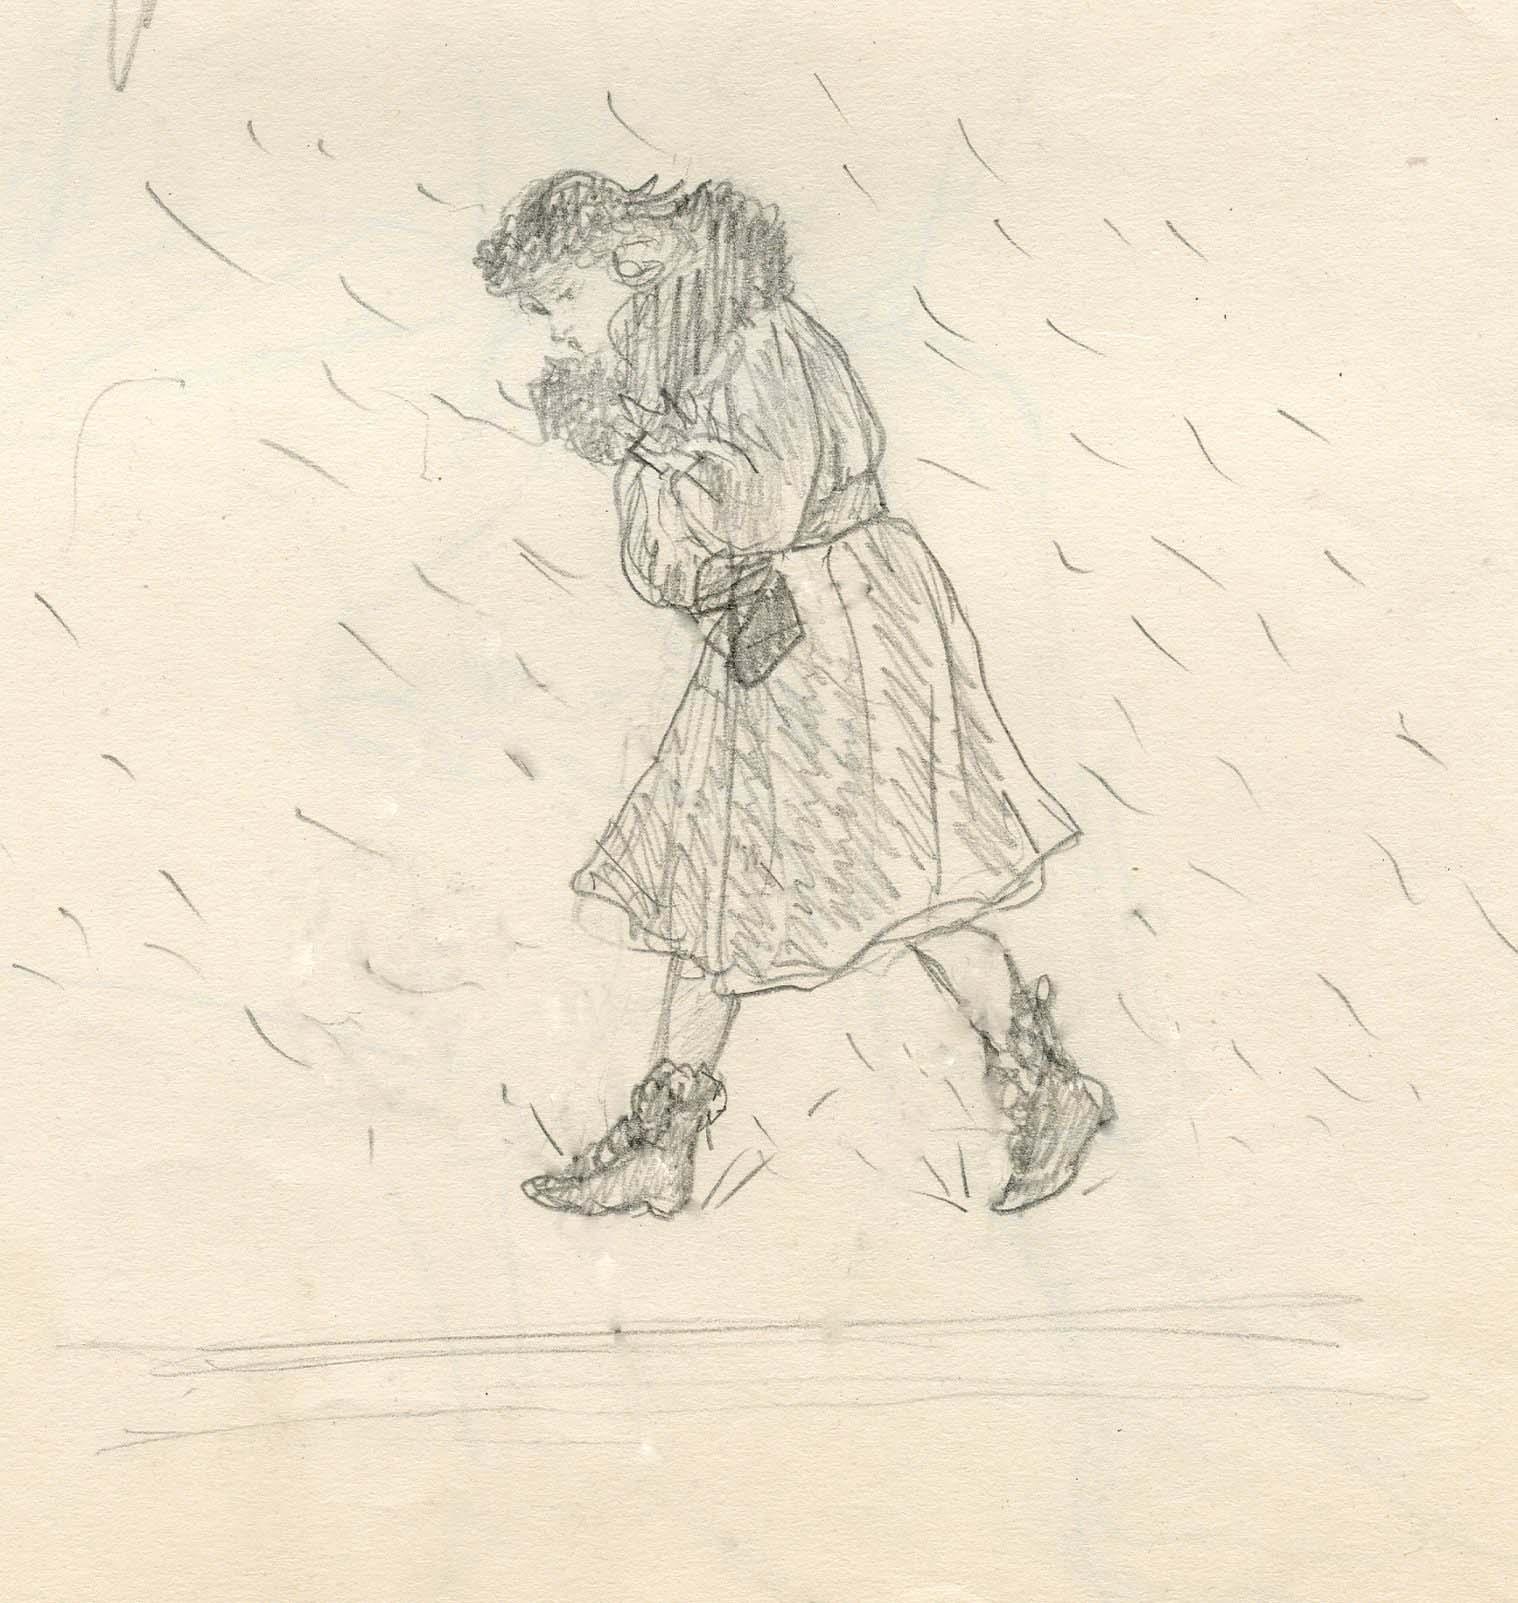 MSB, Winter in the City, Cartoon Series, New York, 1941.